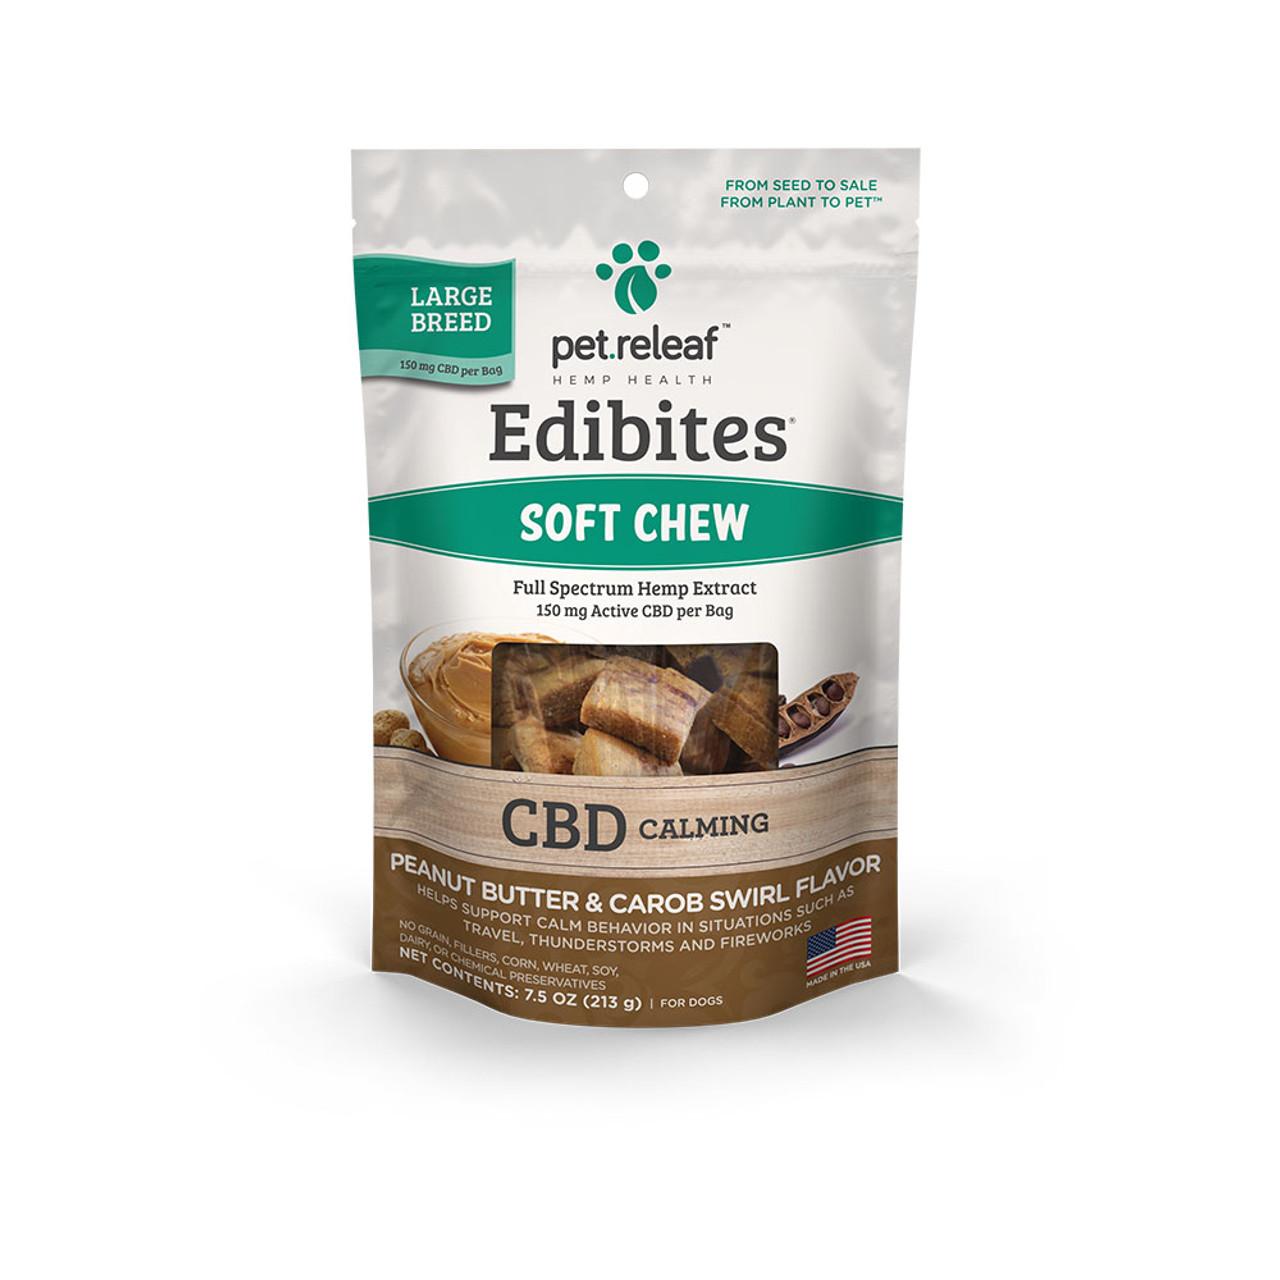 Pet Releaf Edibites Large Breed Peanut Butter & Carob Swirl Soft Chew Hemp Dog Supplements -Front